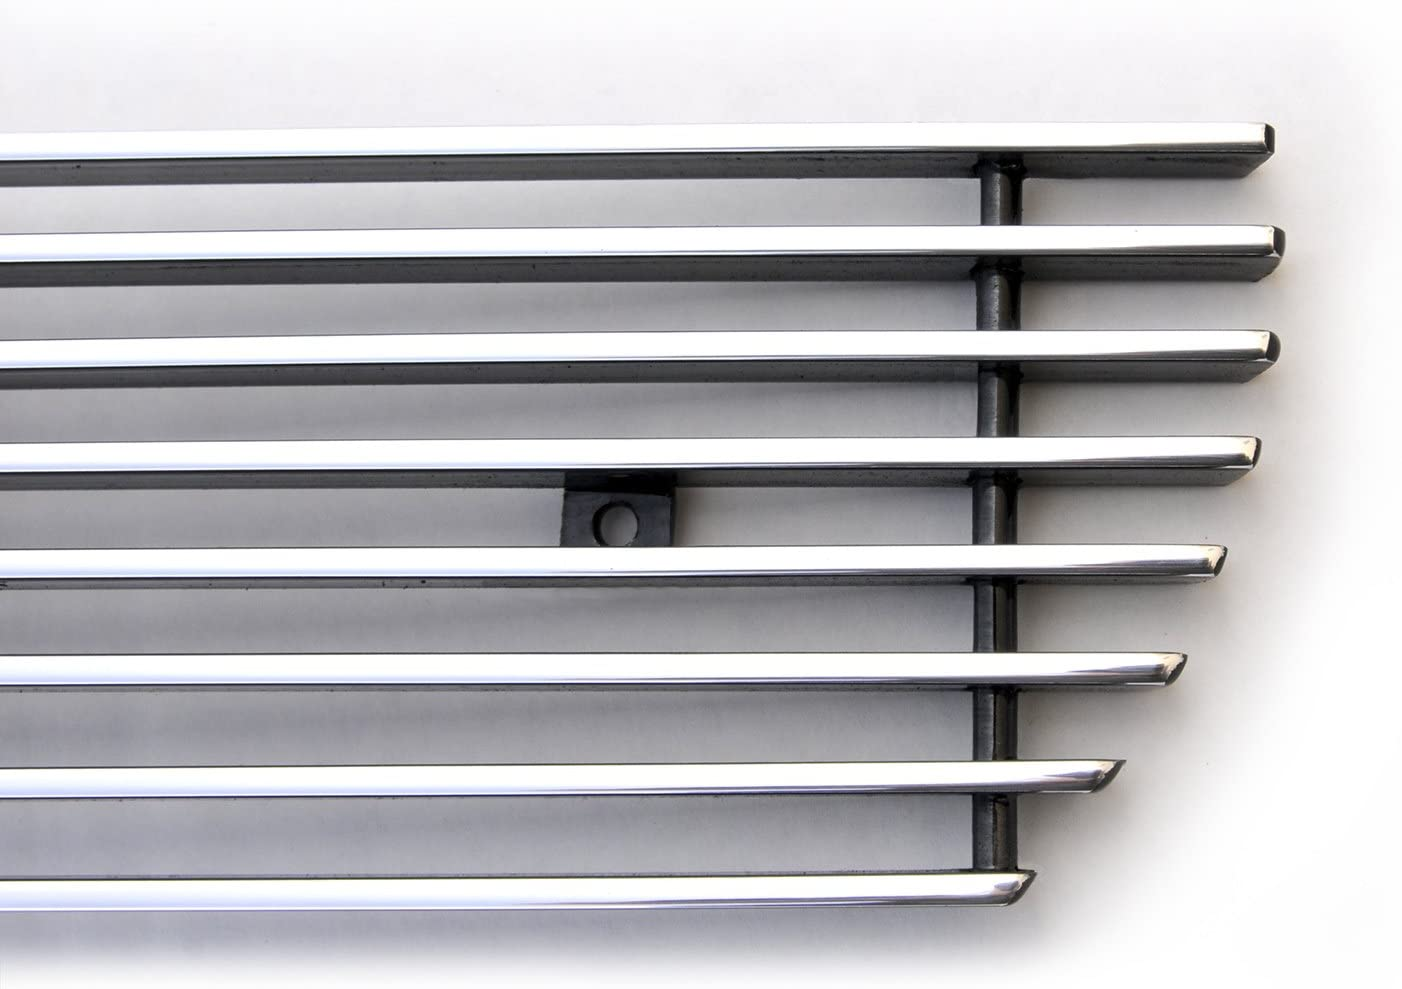 T-Rex 25206 Horizontal Aluminum Polished Finish Billet Bumper Grille Bolt-on for GMC Sierra 1500